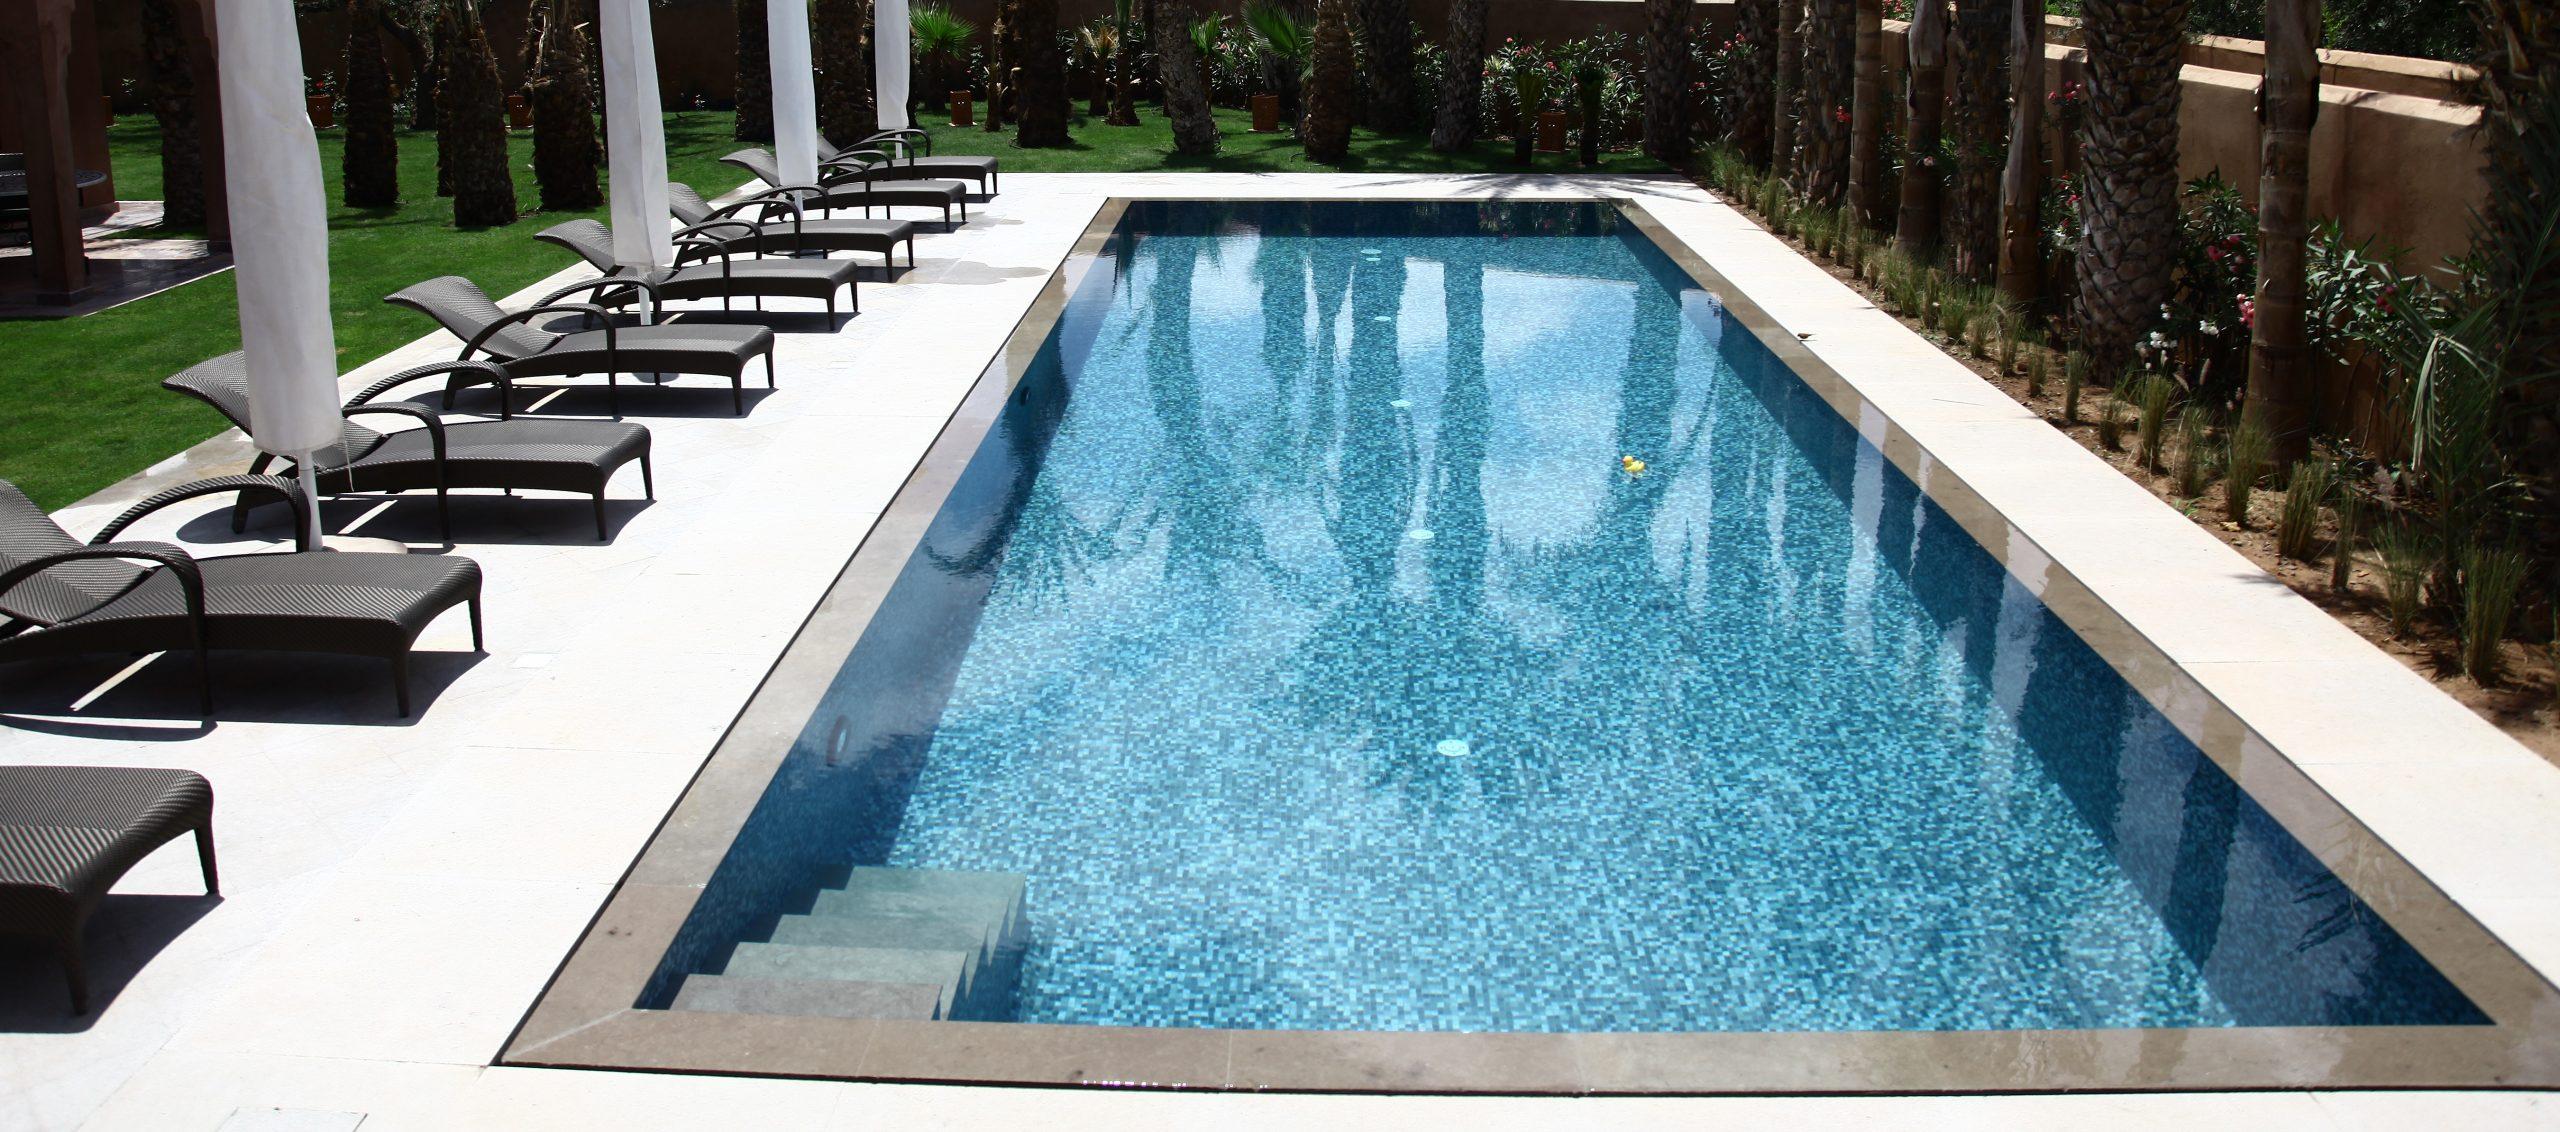 Quelle Piscine Choisir ? | Excellence Swimming Pool And Spa intérieur Quelle Piscine Choisir